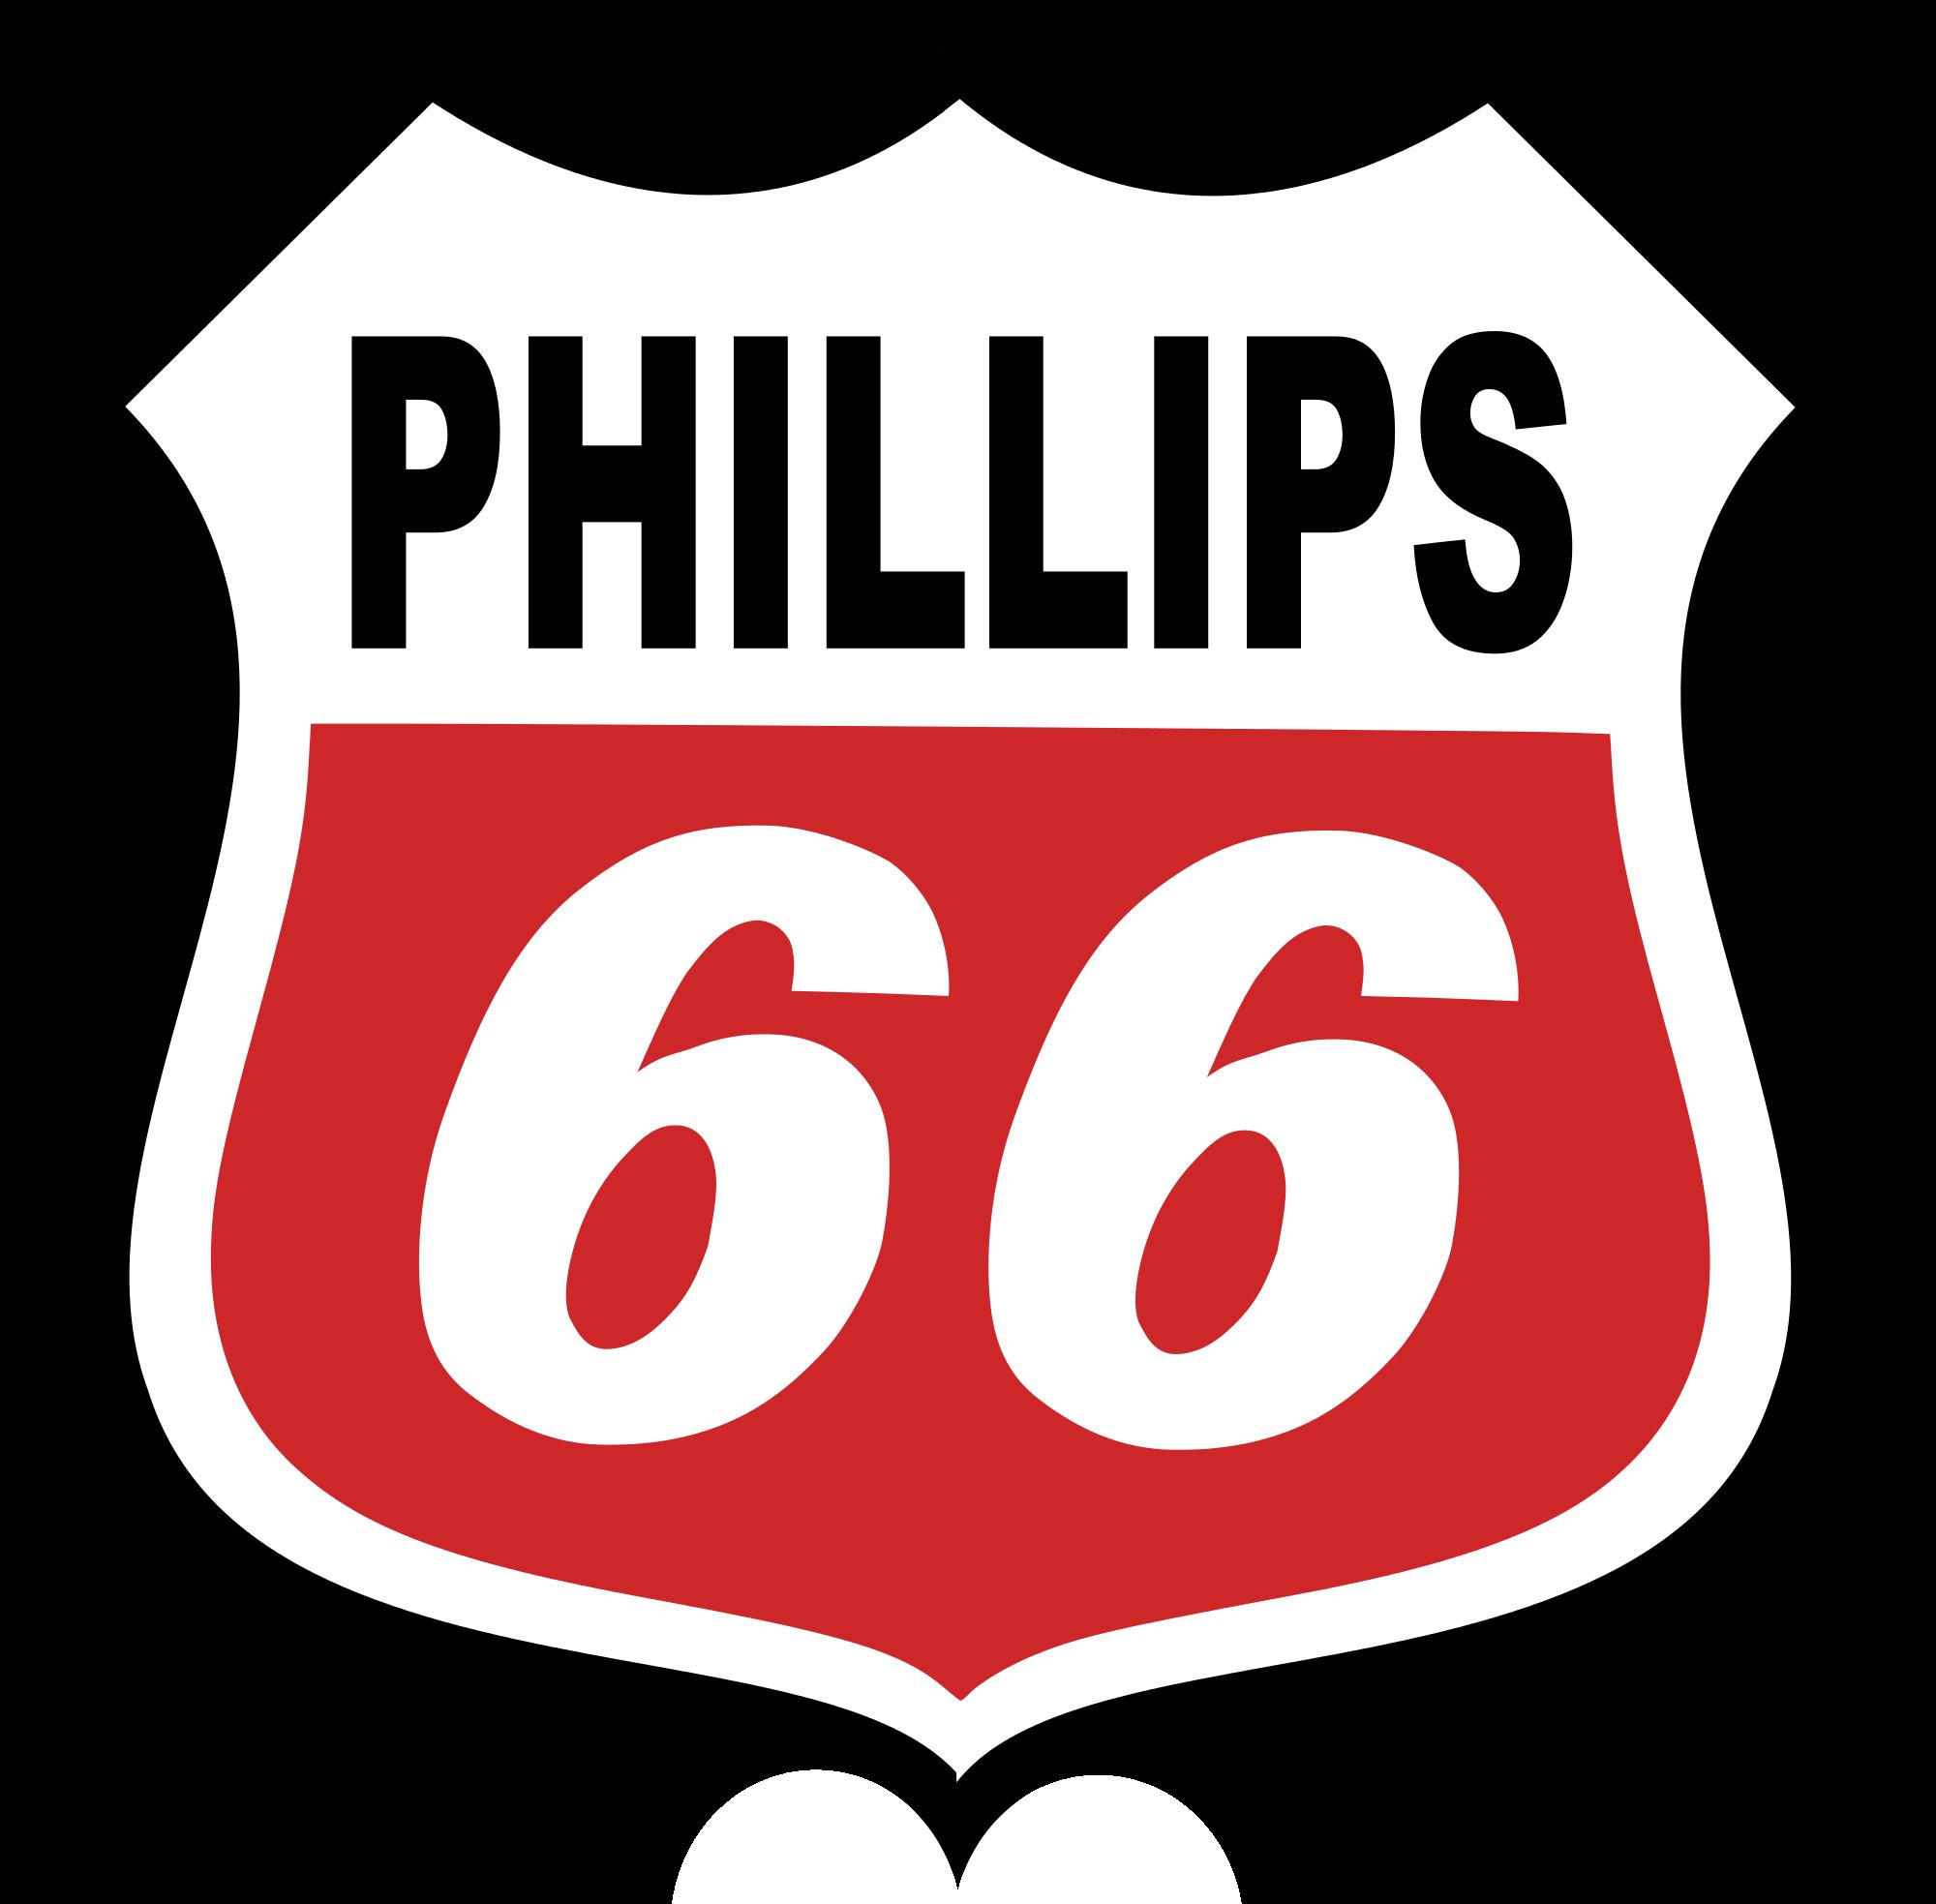 Phillips 66 Philgear Industrial Lube 220 Cross Ref